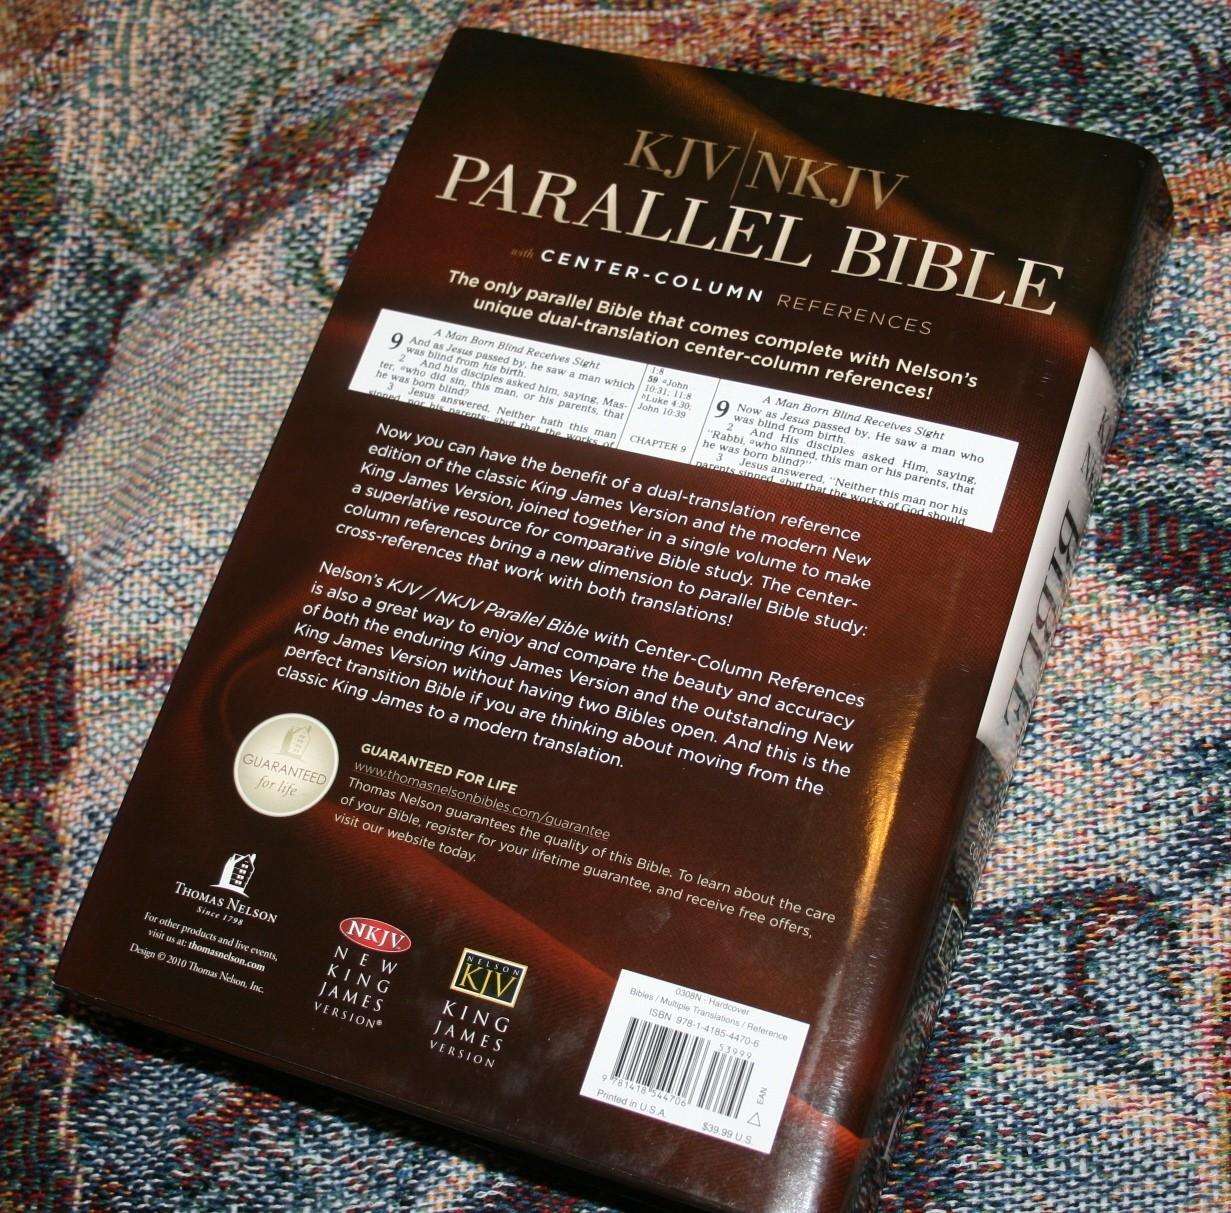 Bible Study Reference: Thomas Nelson KJV NKJV Parallel Bible